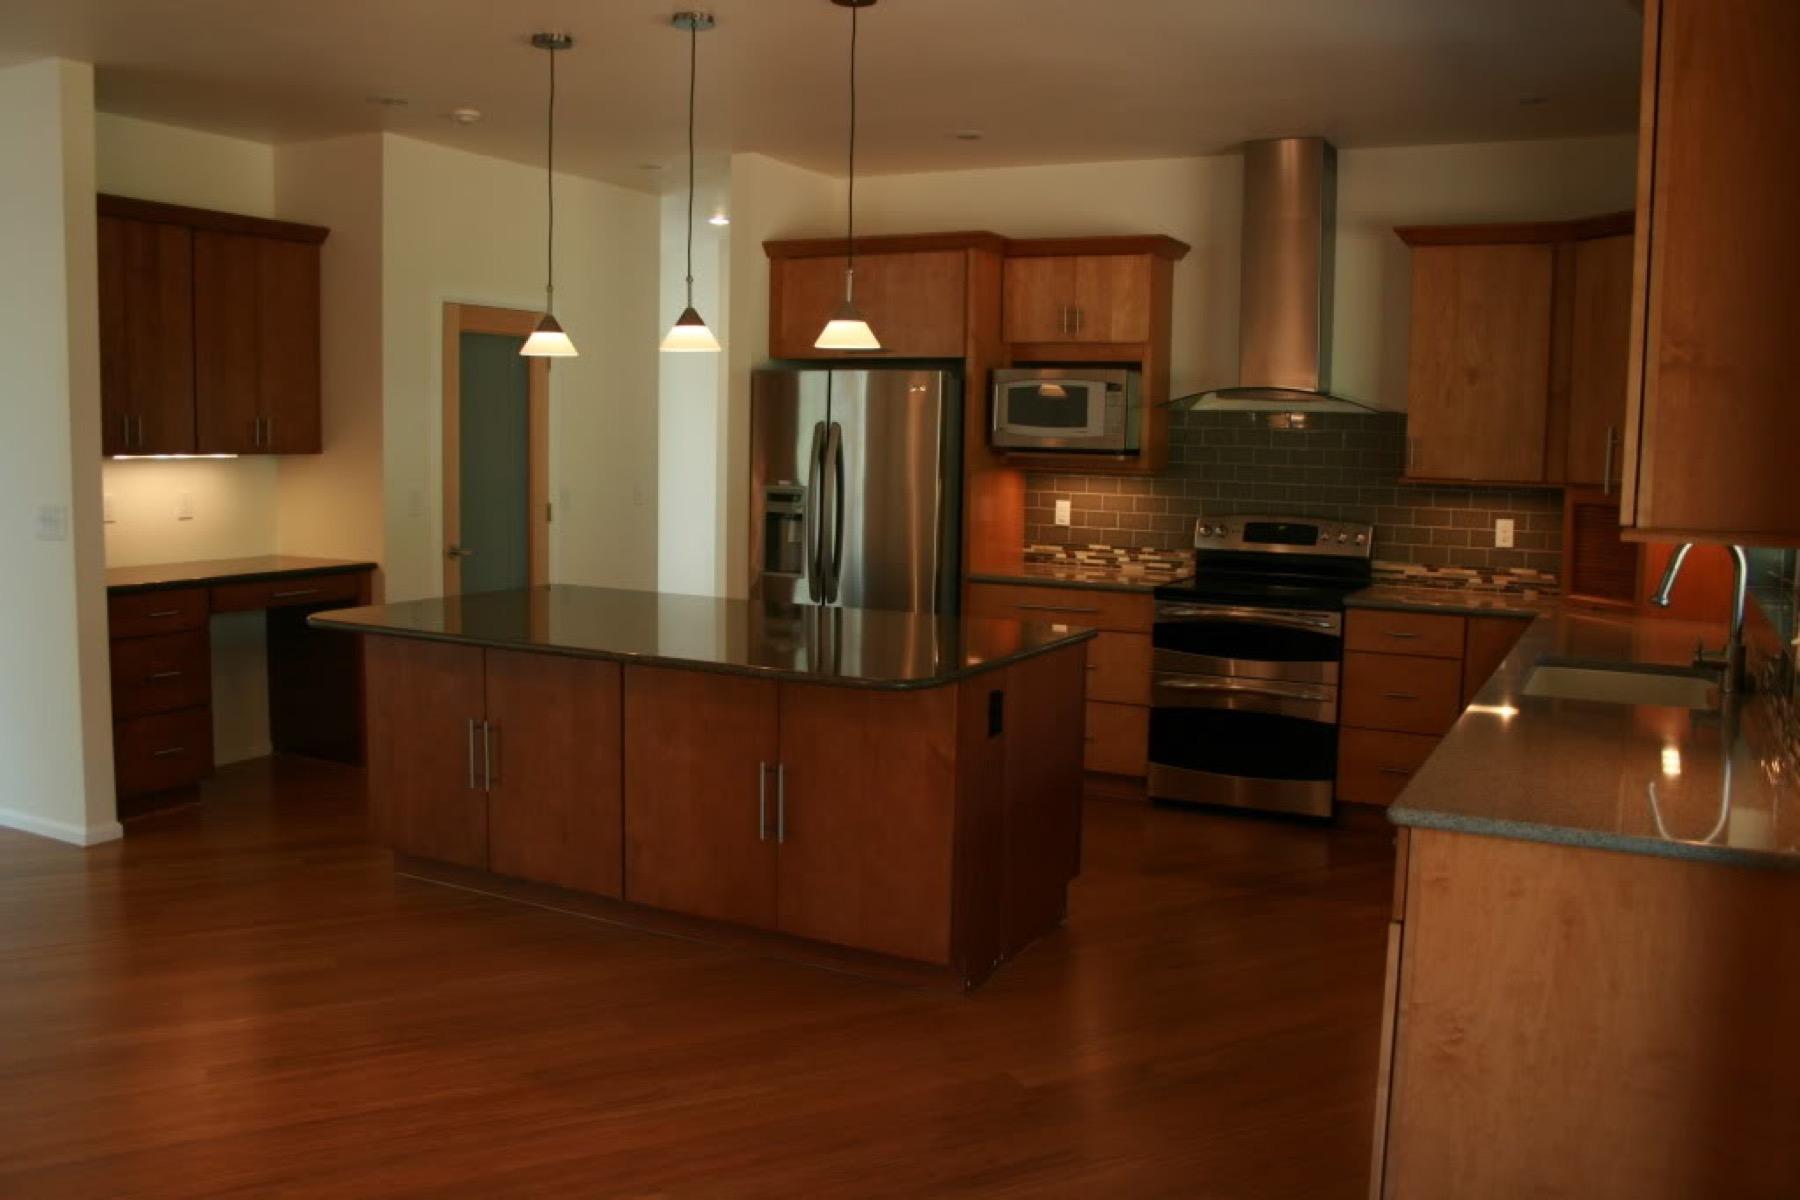 Kelley_Home_Services_Gig_Harbor_Home_Construction_27.jpg